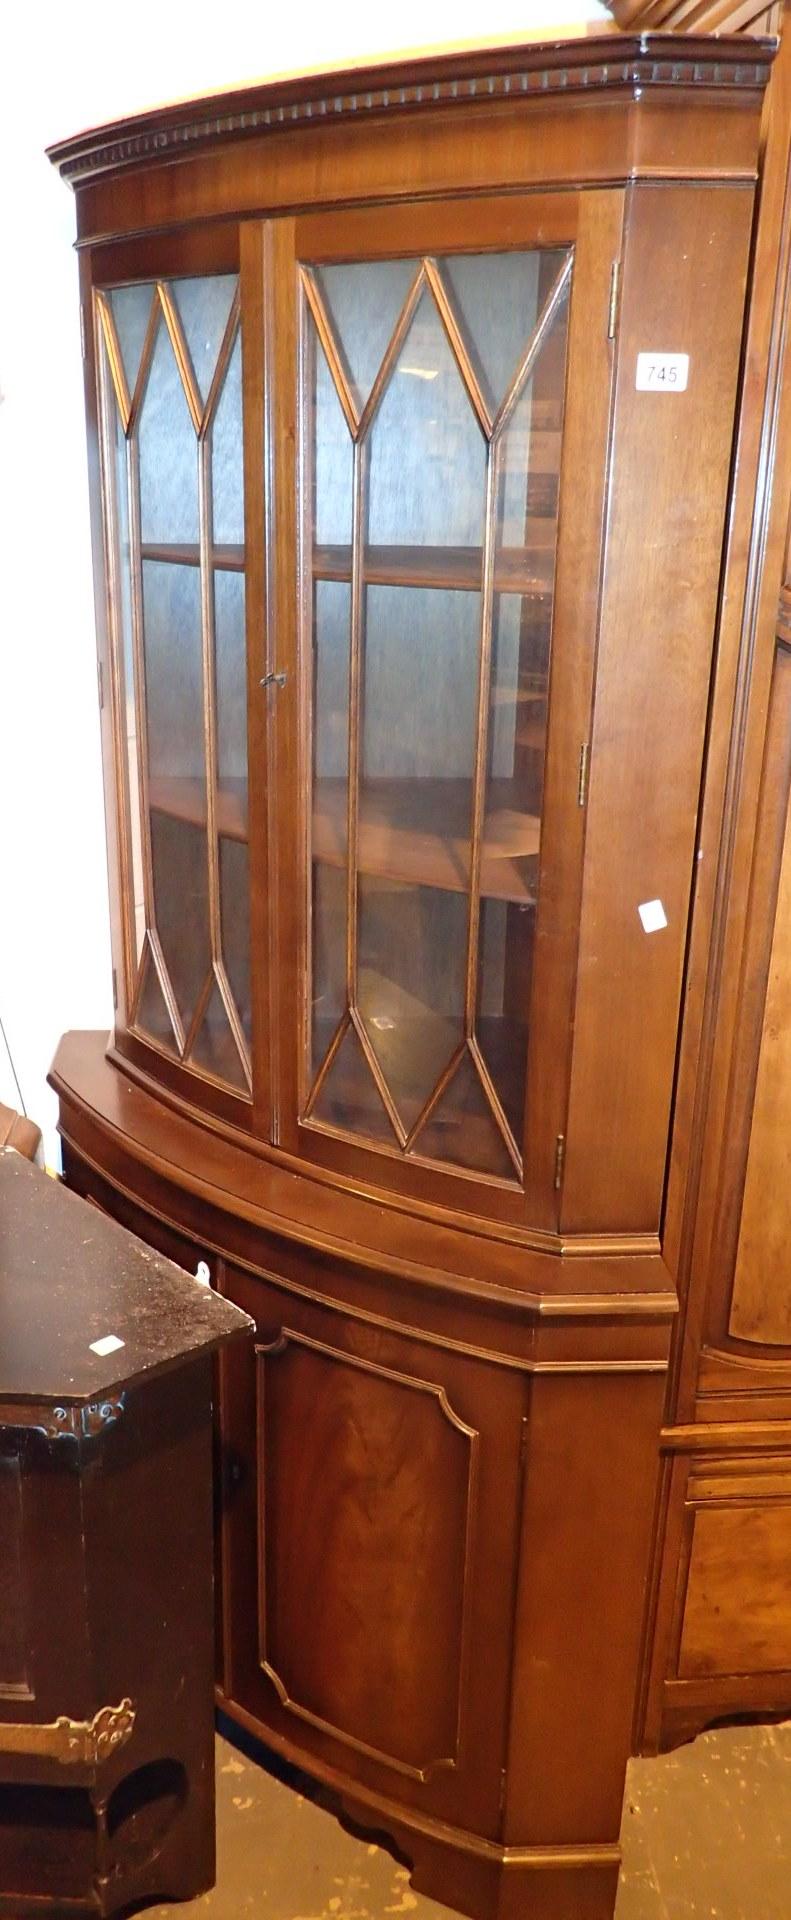 Lot 745 - Large mahogany Reprodux corner cupboard with glazed door